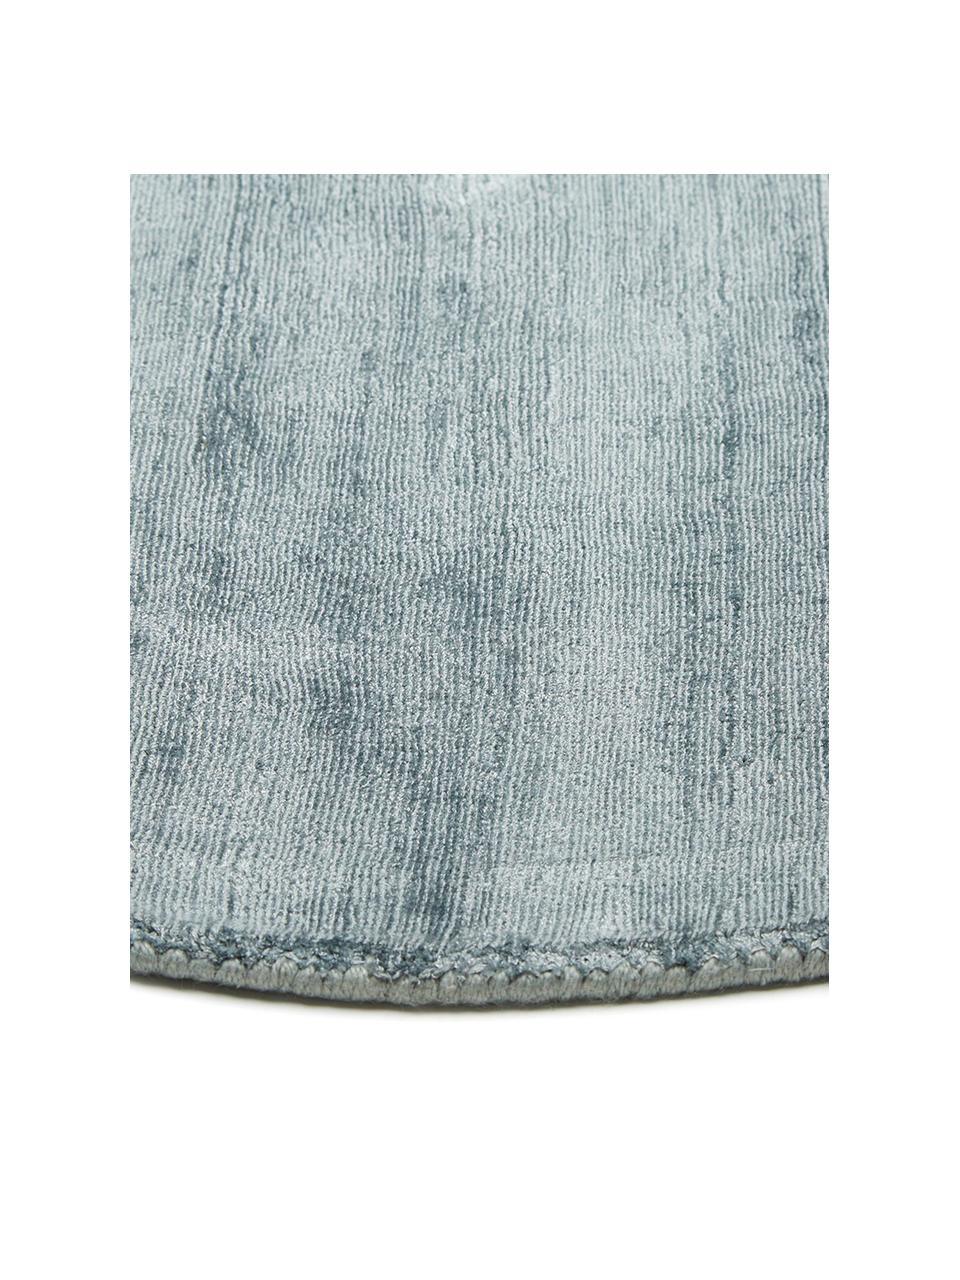 Runder Viskoseteppich Jane in Eisblau, handgewebt, Flor: 100% Viskose, Eisblau, Ø 200 cm (Größe L)